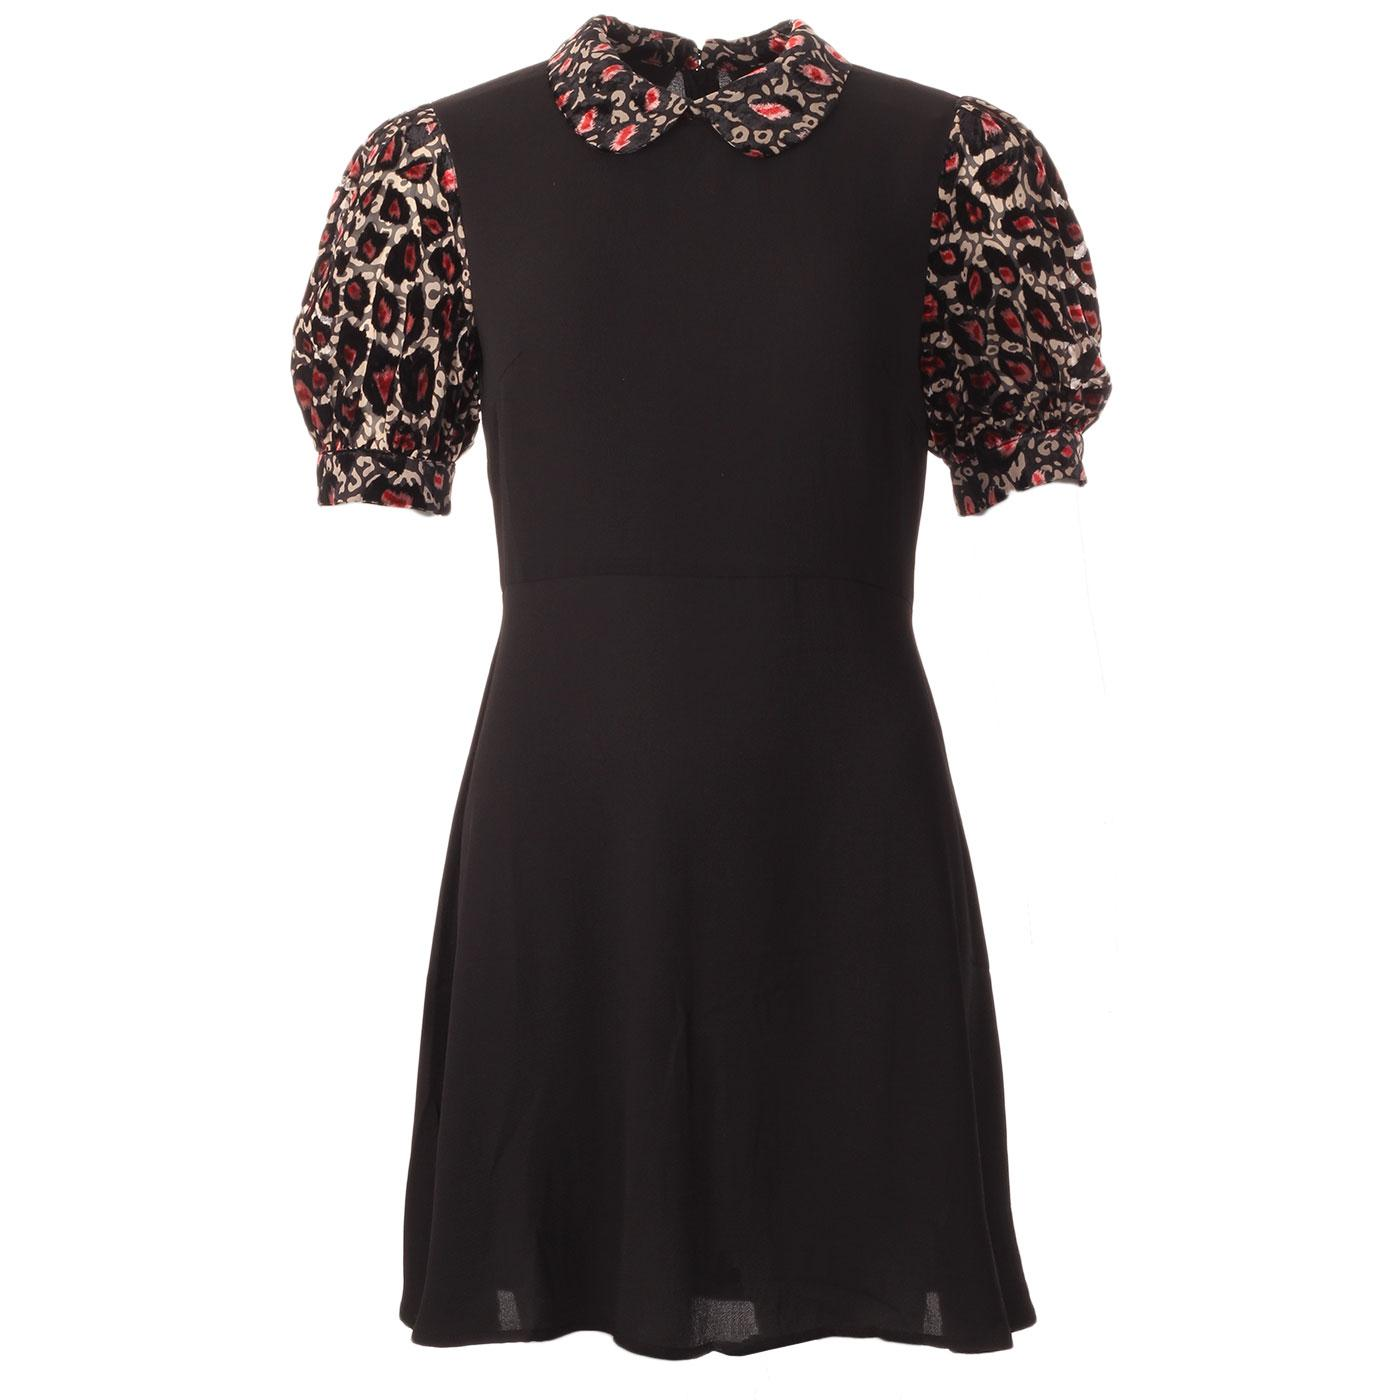 Grace TRAFFIC PEOPLE Retro 60s Contrast Trim Dress